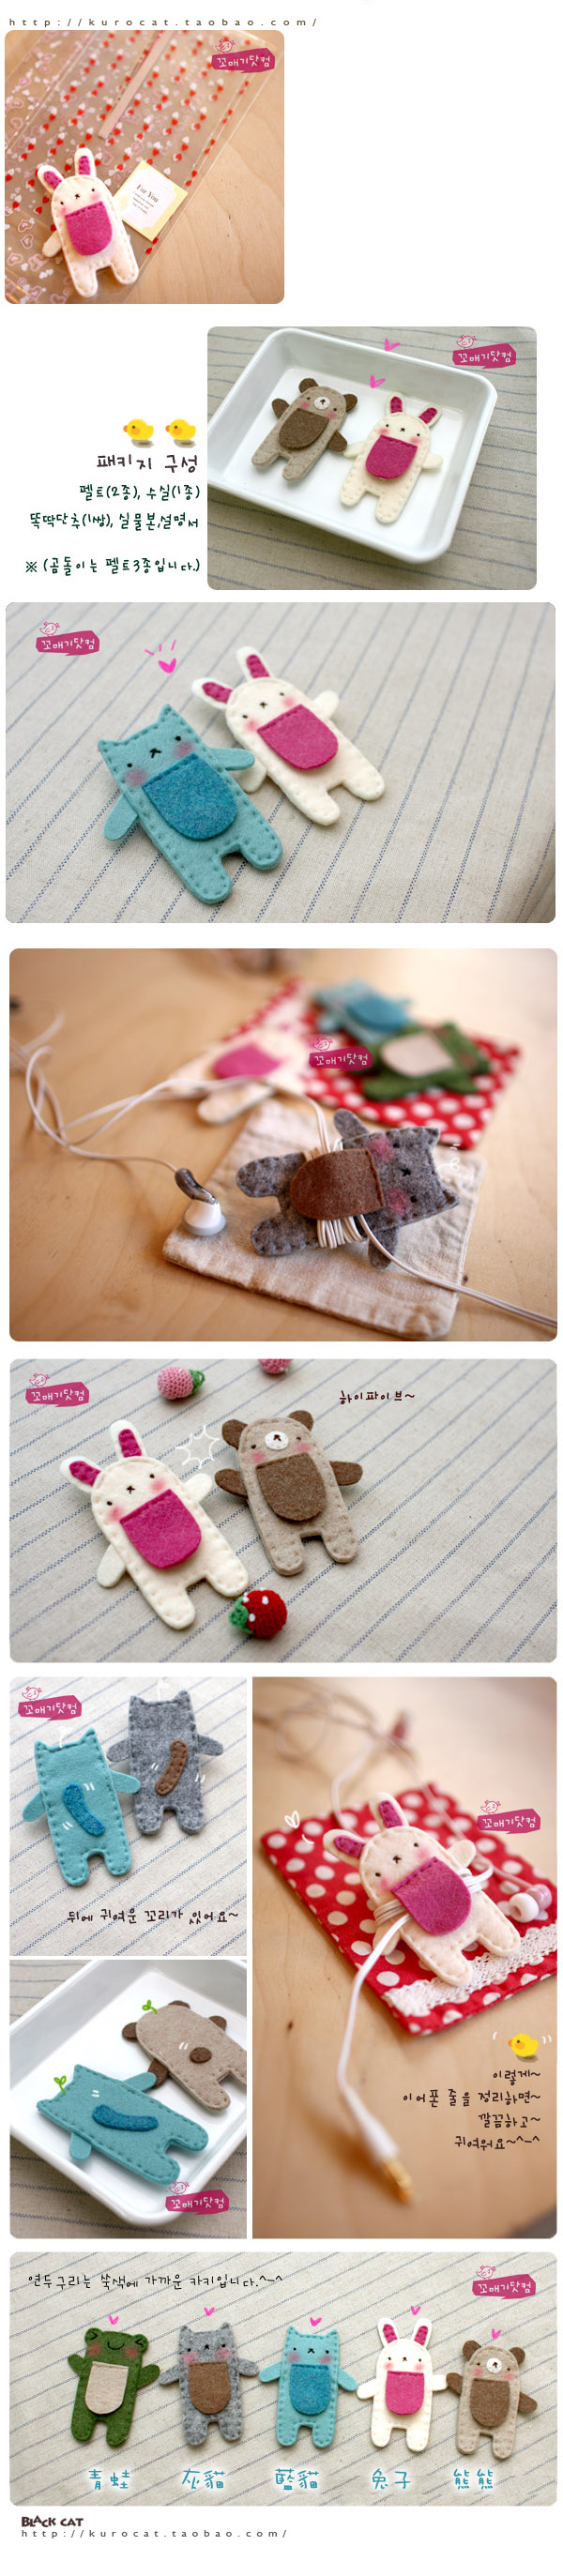 * Nueva bobina bobina Exclusivo súper adorable animal conejito * Paquete de material no tejido - Taobao